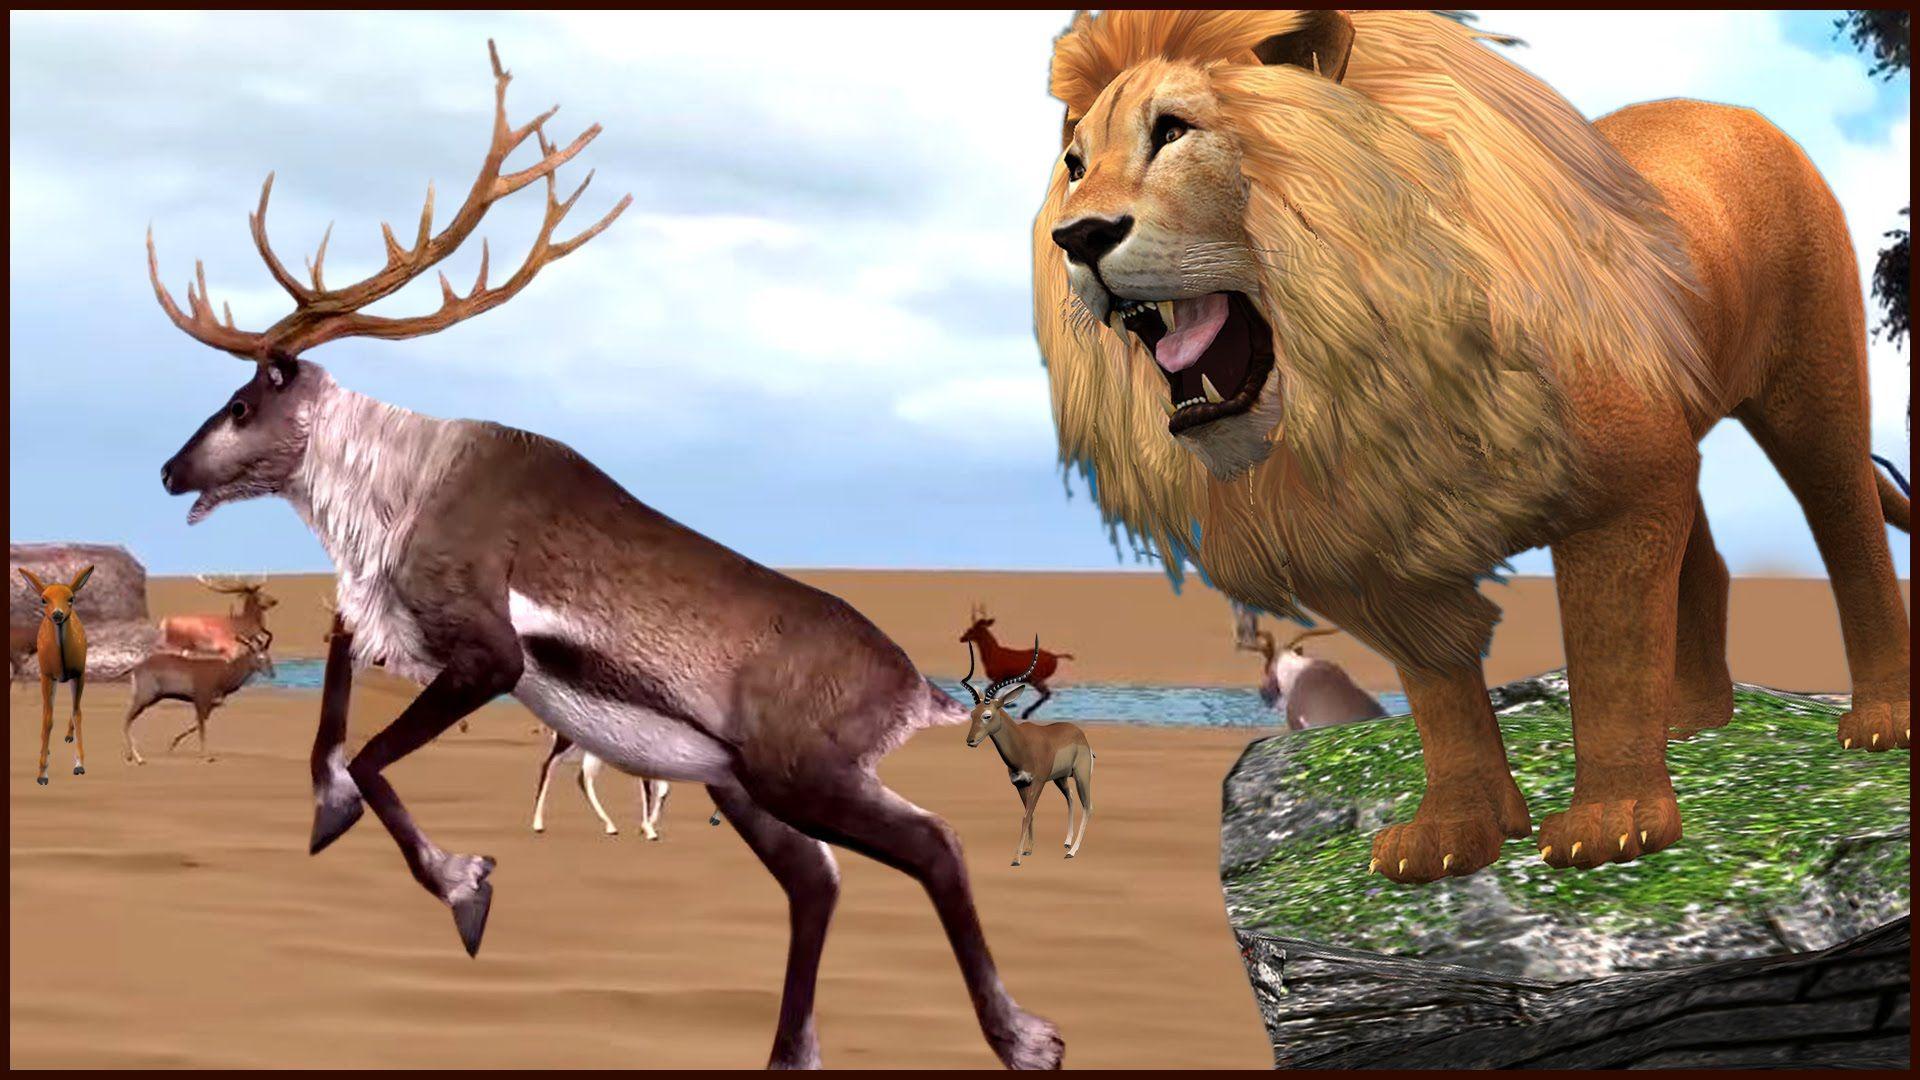 Amazing Lion Vs Deer Wild Animal Cartoon Videos Lion